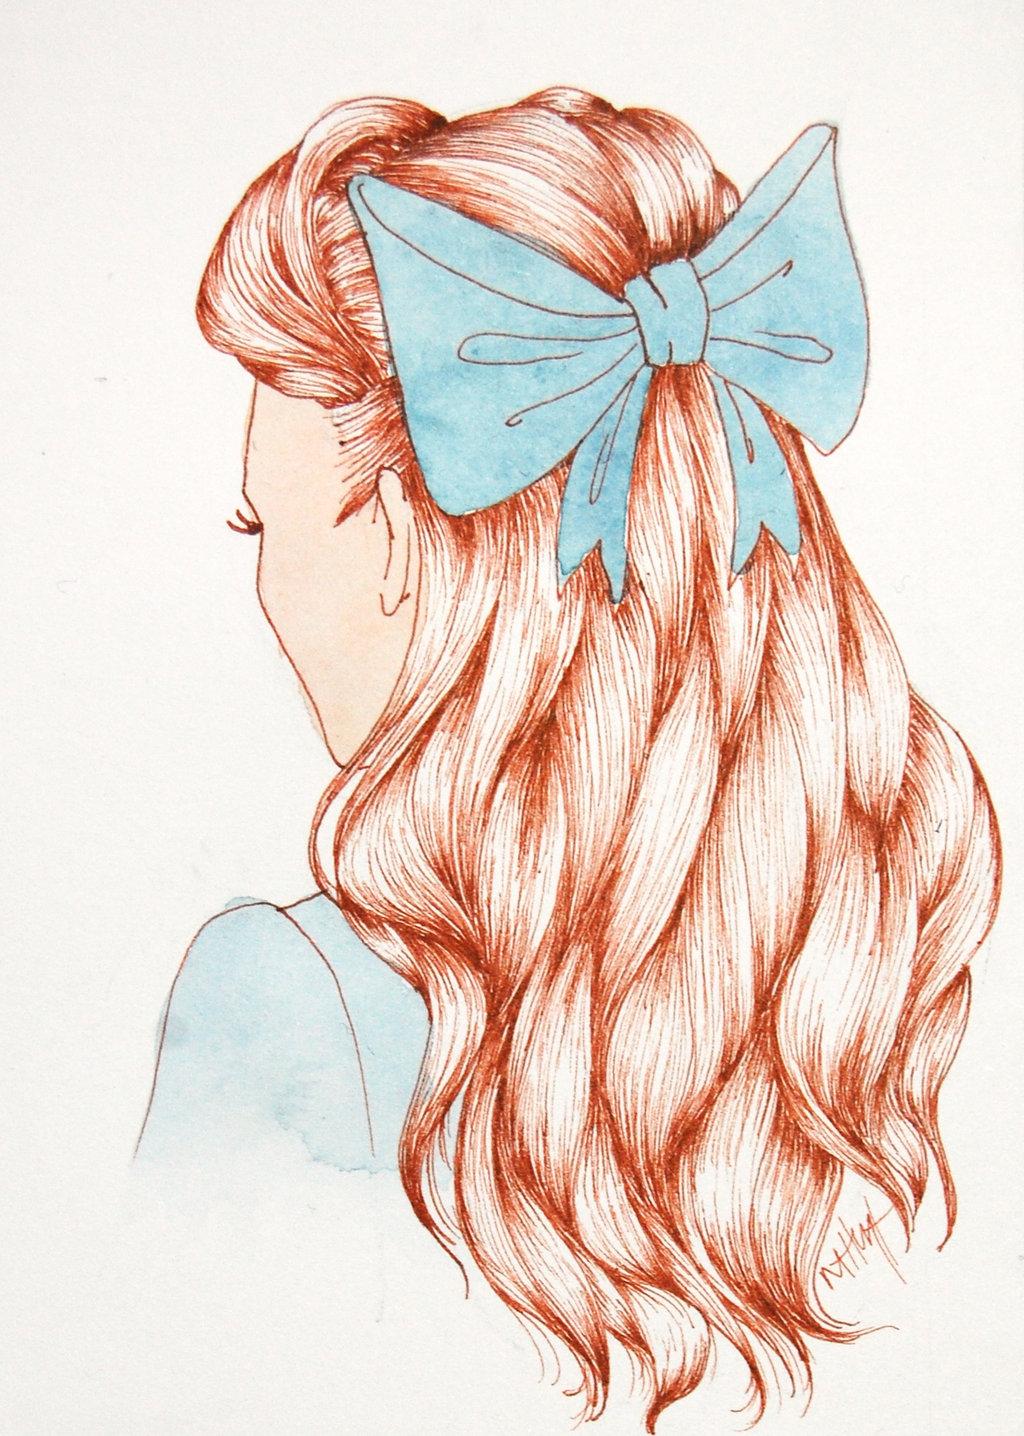 Drawn princess hairstyle disney Disney Cheveux beautifull Hairstyles Pinterest